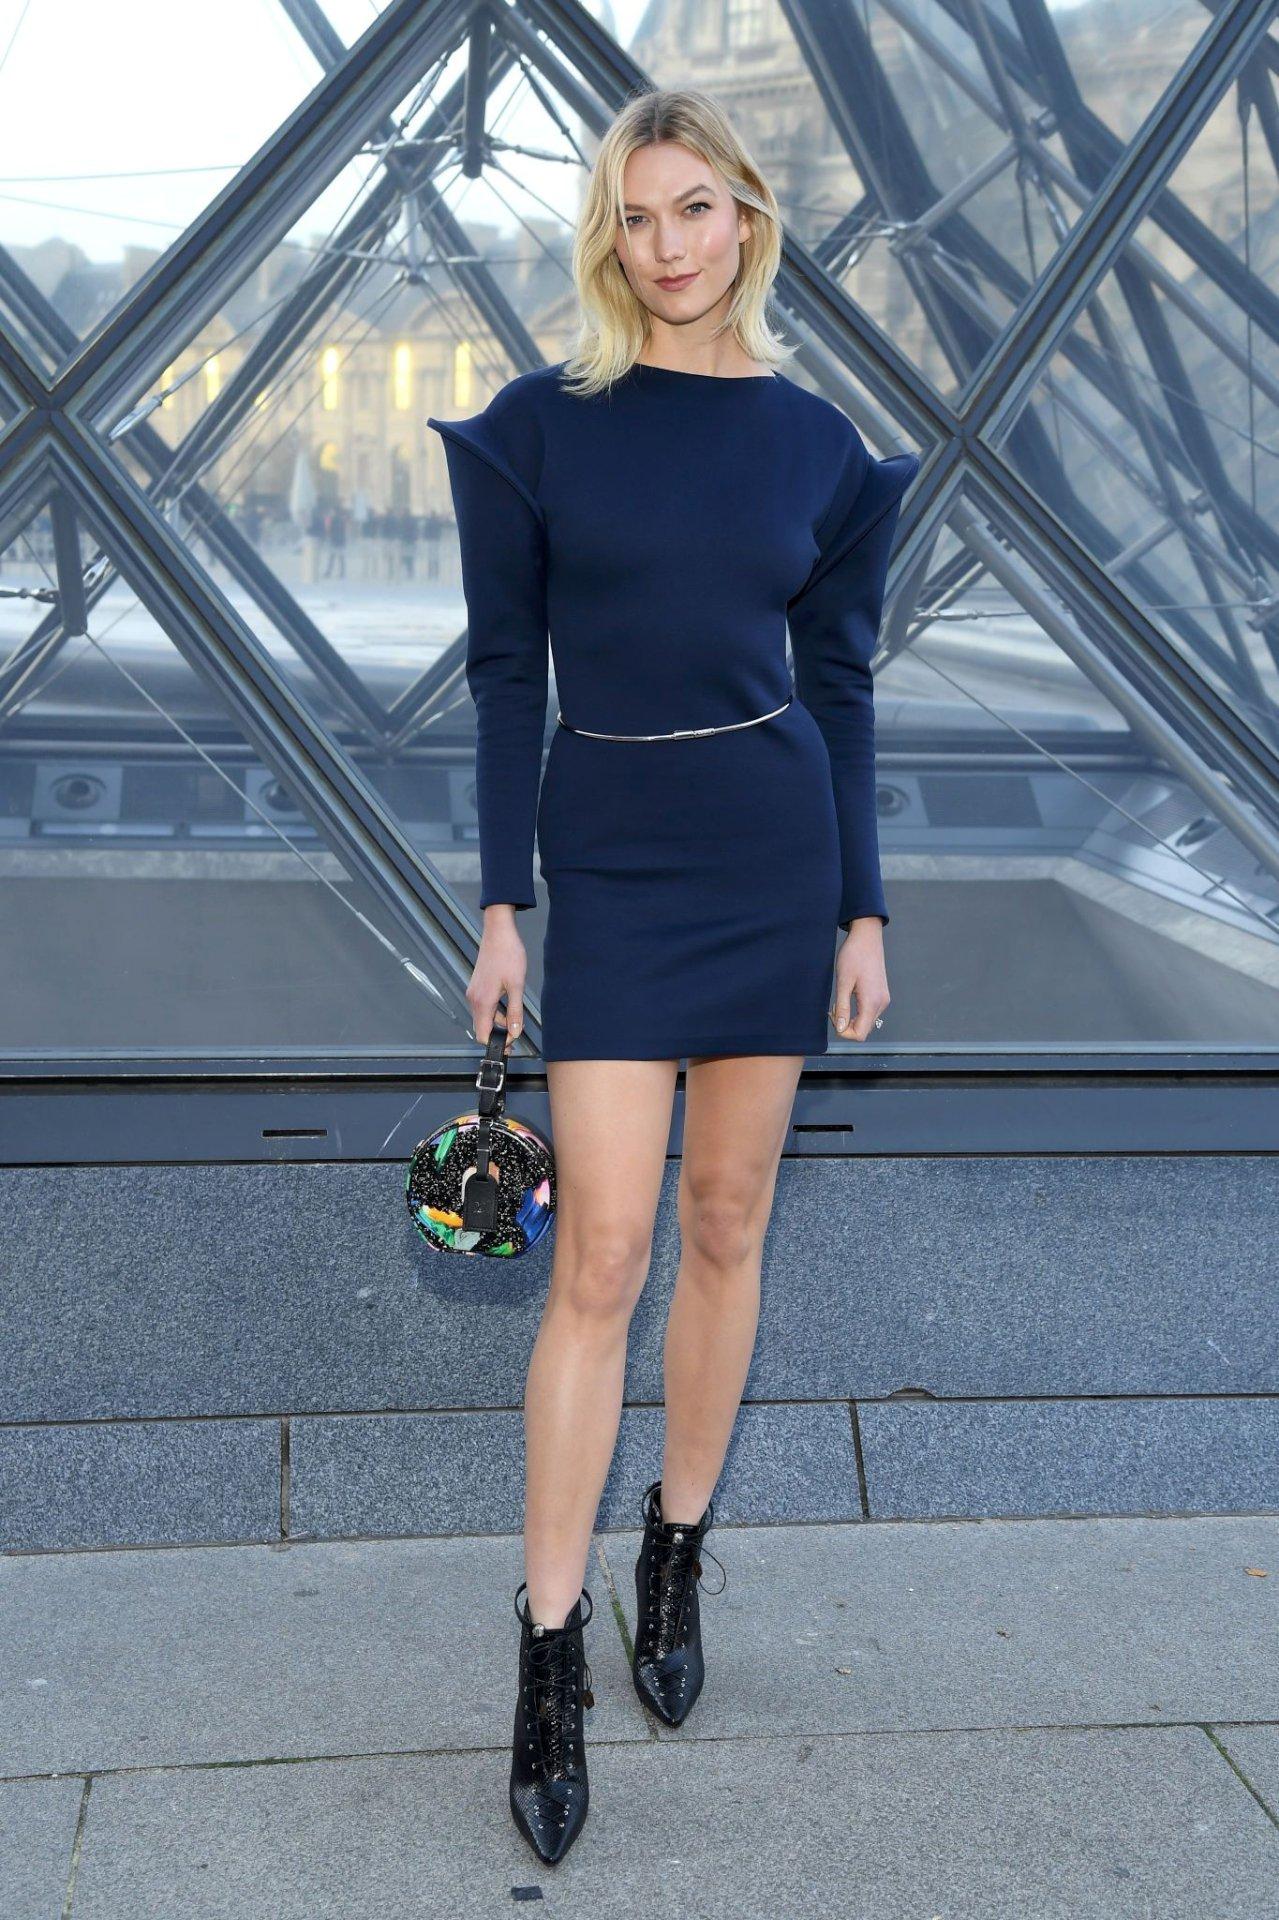 Karlie Kloss - Louis Vuitton Fashion Show in Paris | Hot Celebs Home